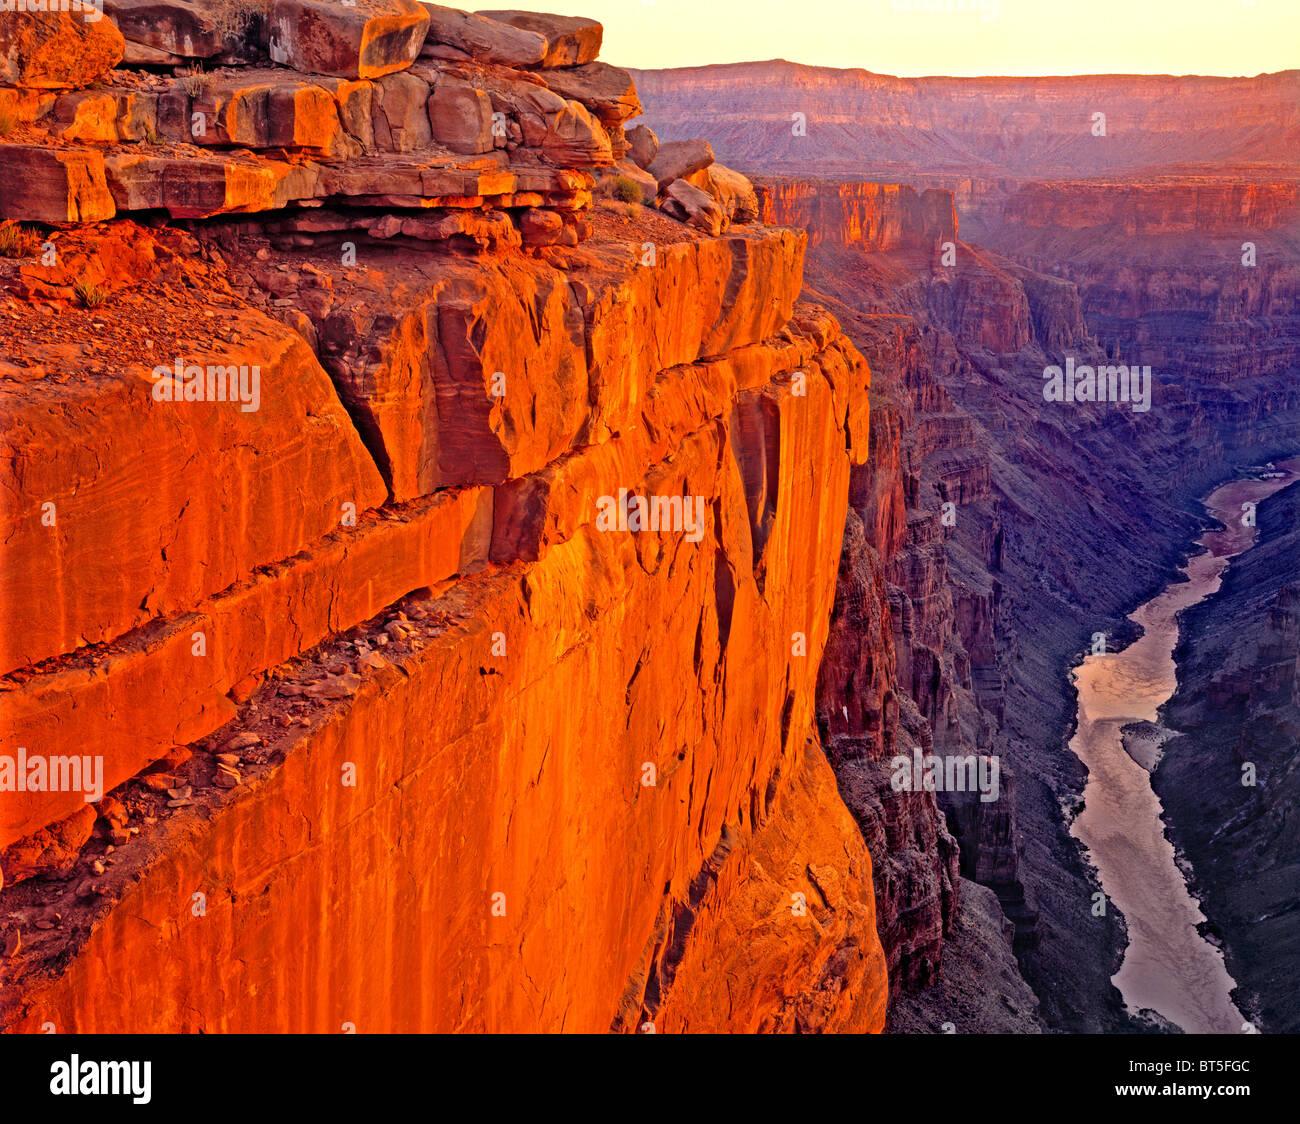 Sonnenaufgang über den Colorado River bei Toroweep, Grand Canyon Nationalpark in Arizona Stockfoto